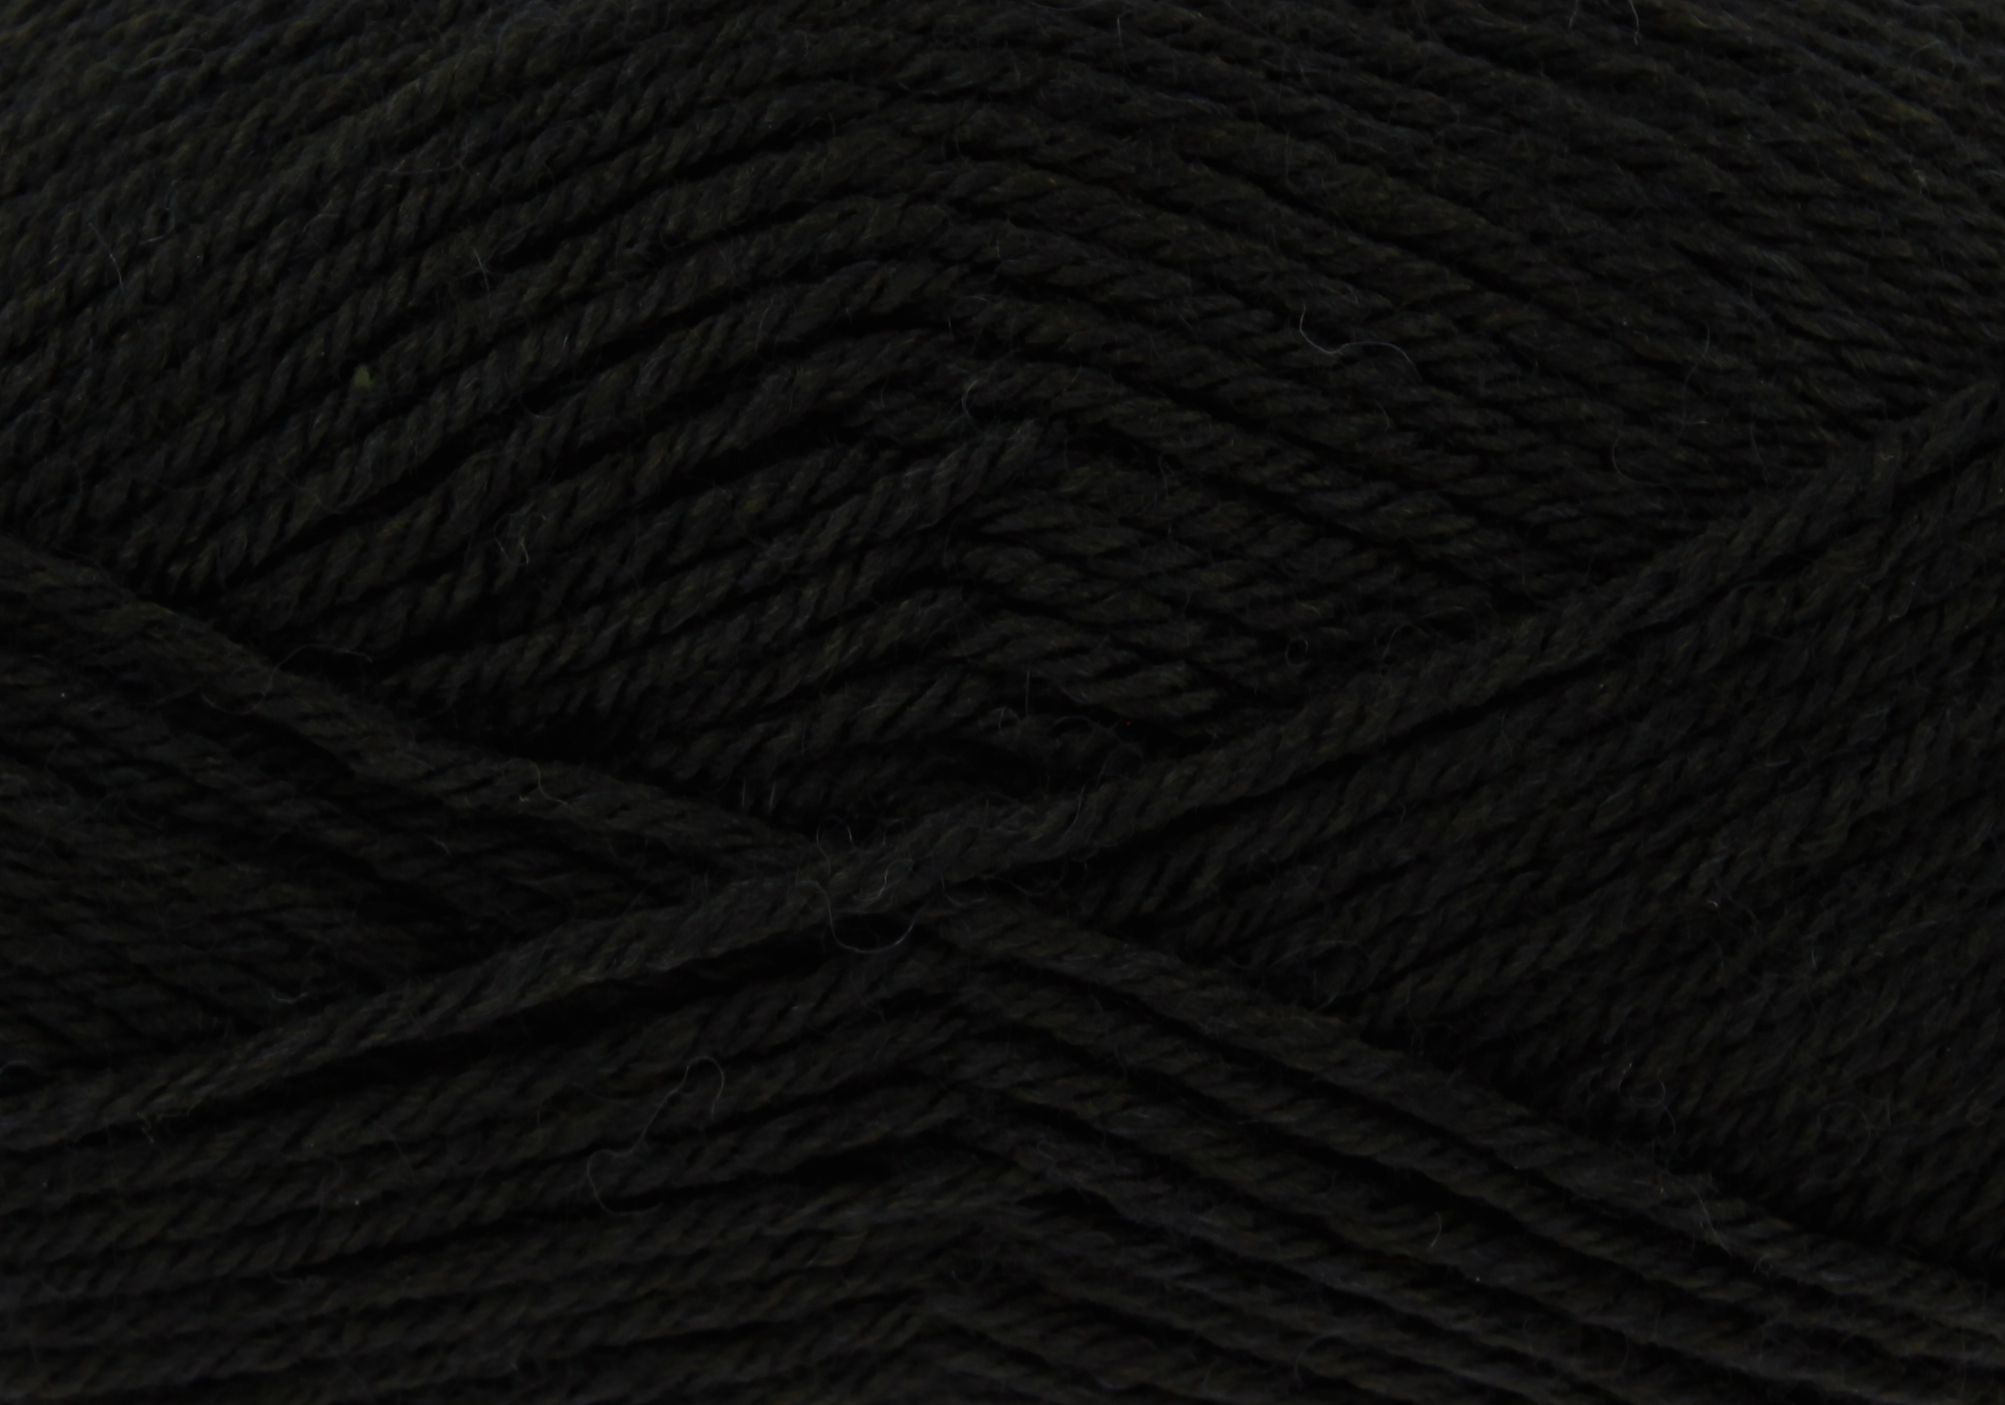 Yarn 50g 2641 White King Cole MAJESTIC DK Knitting Wool